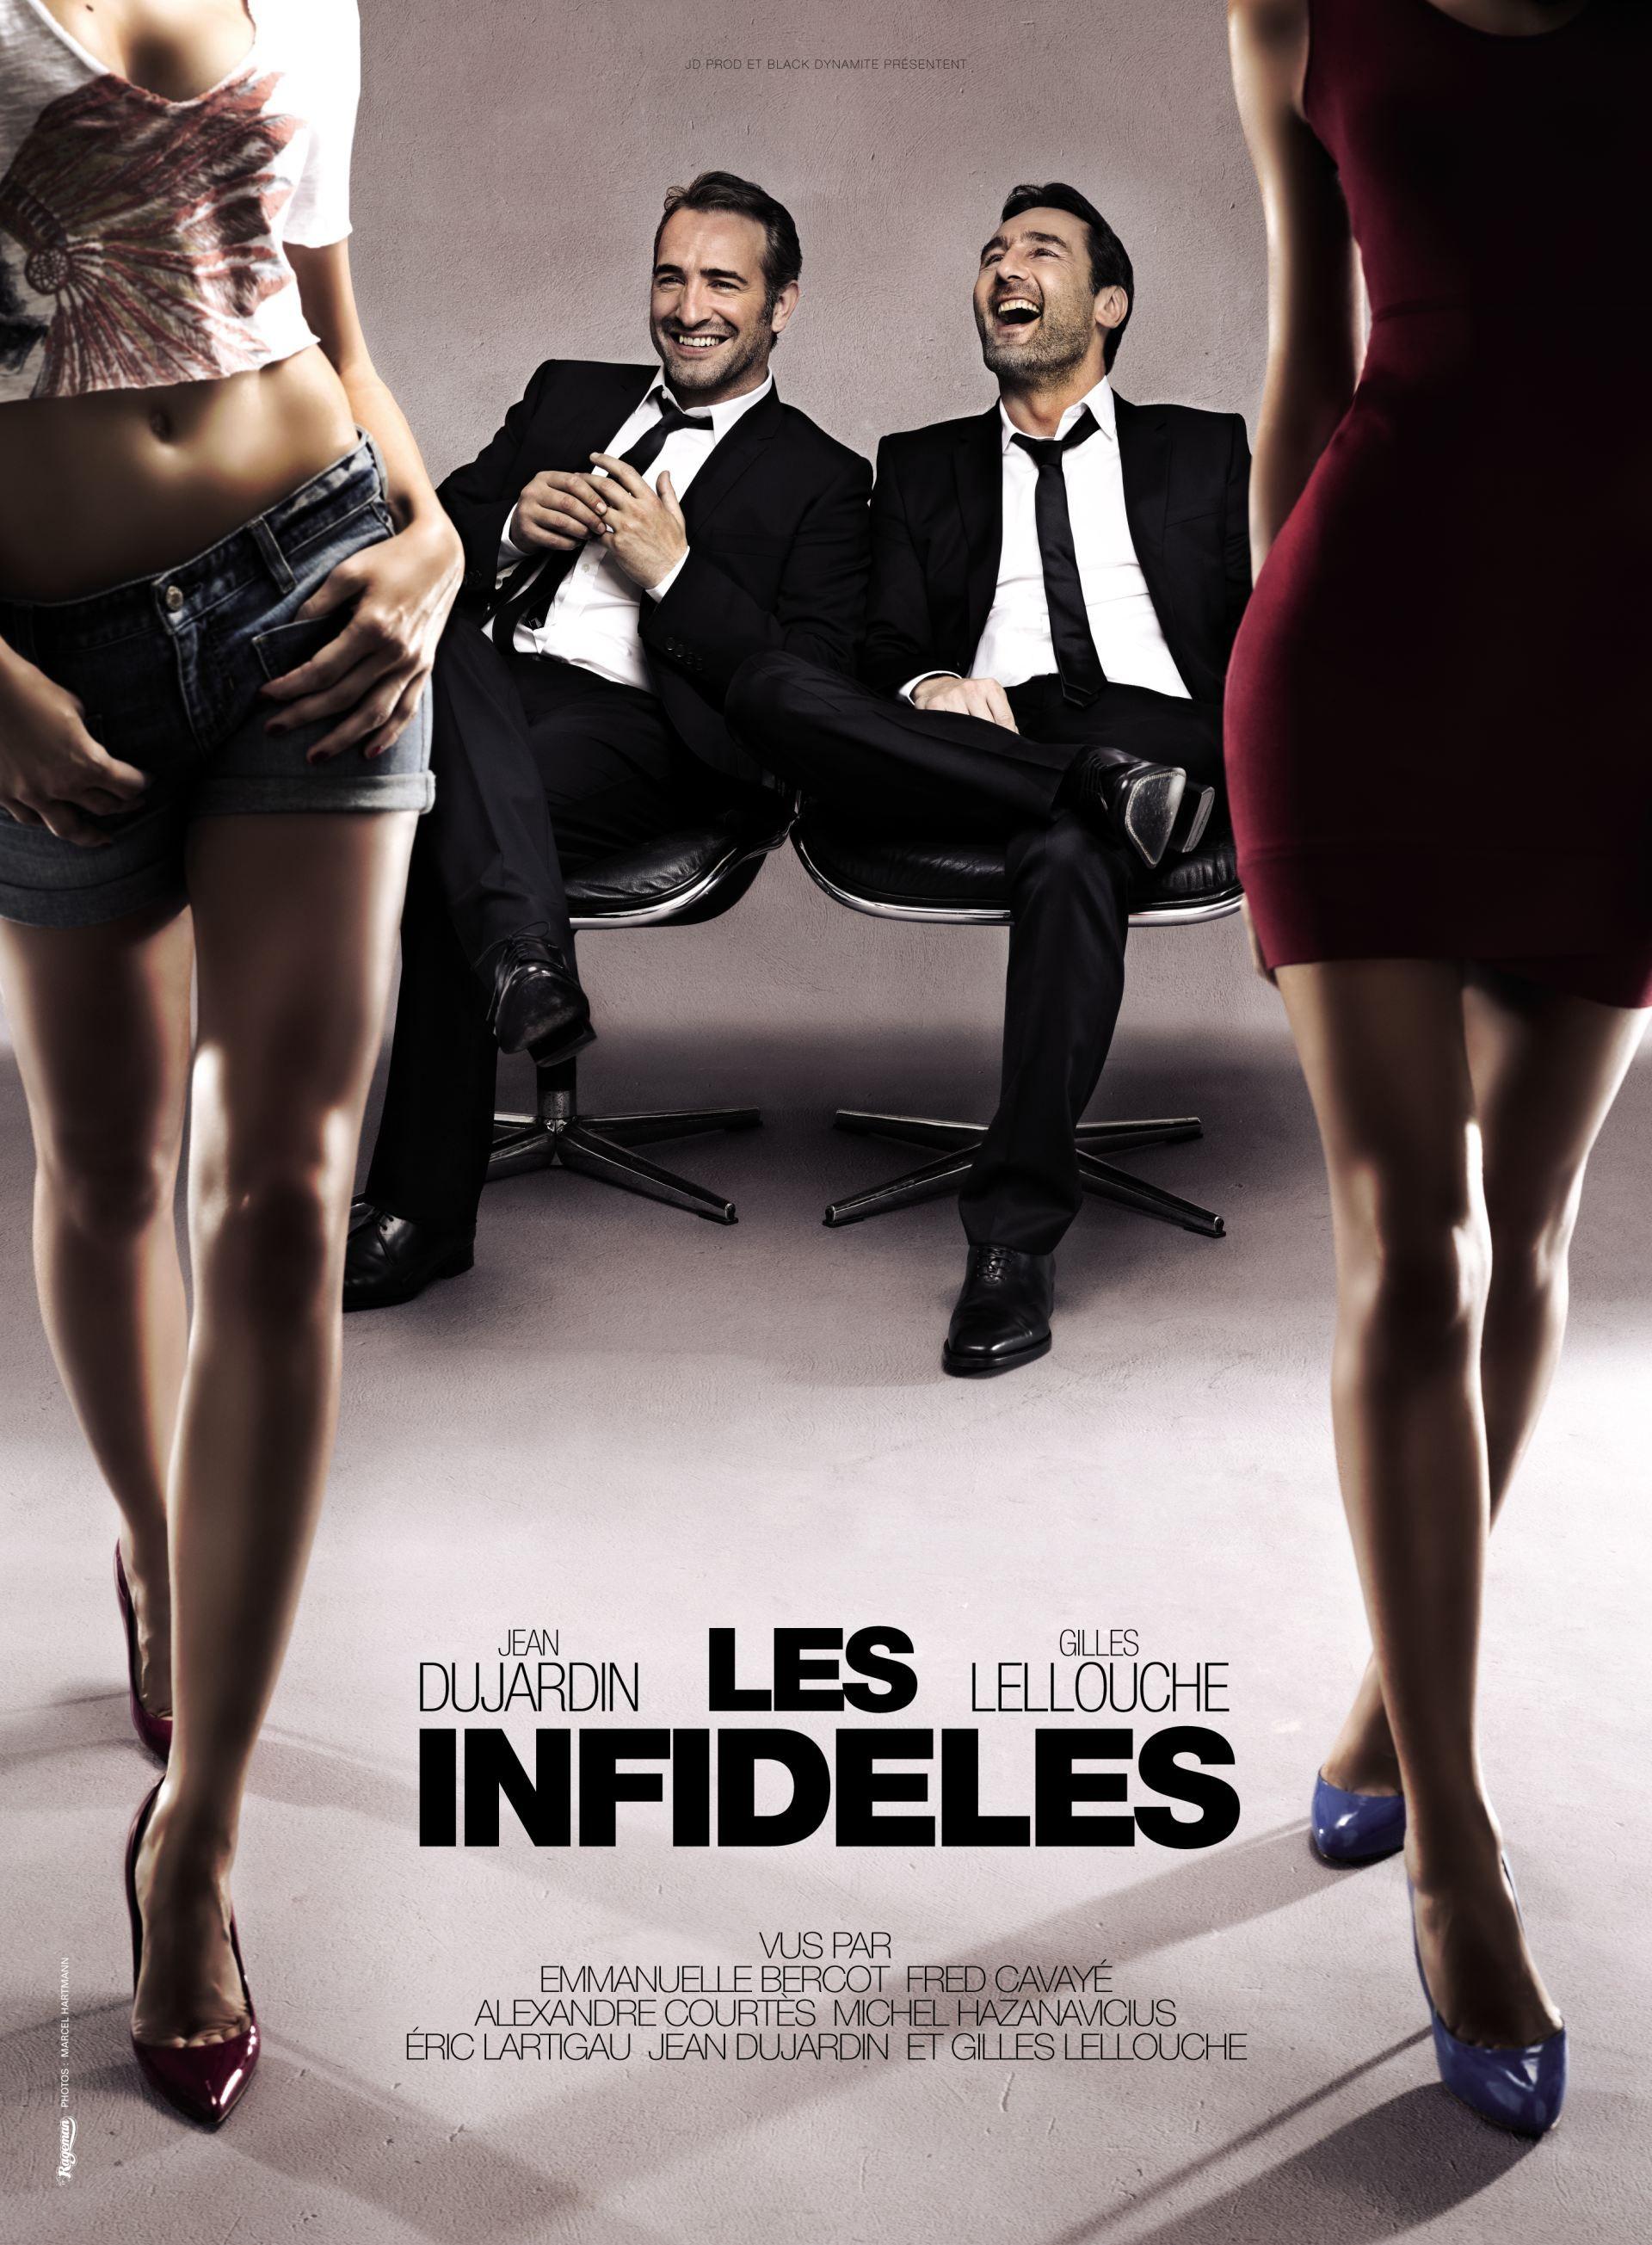 Les Infidèles - Film (2012)